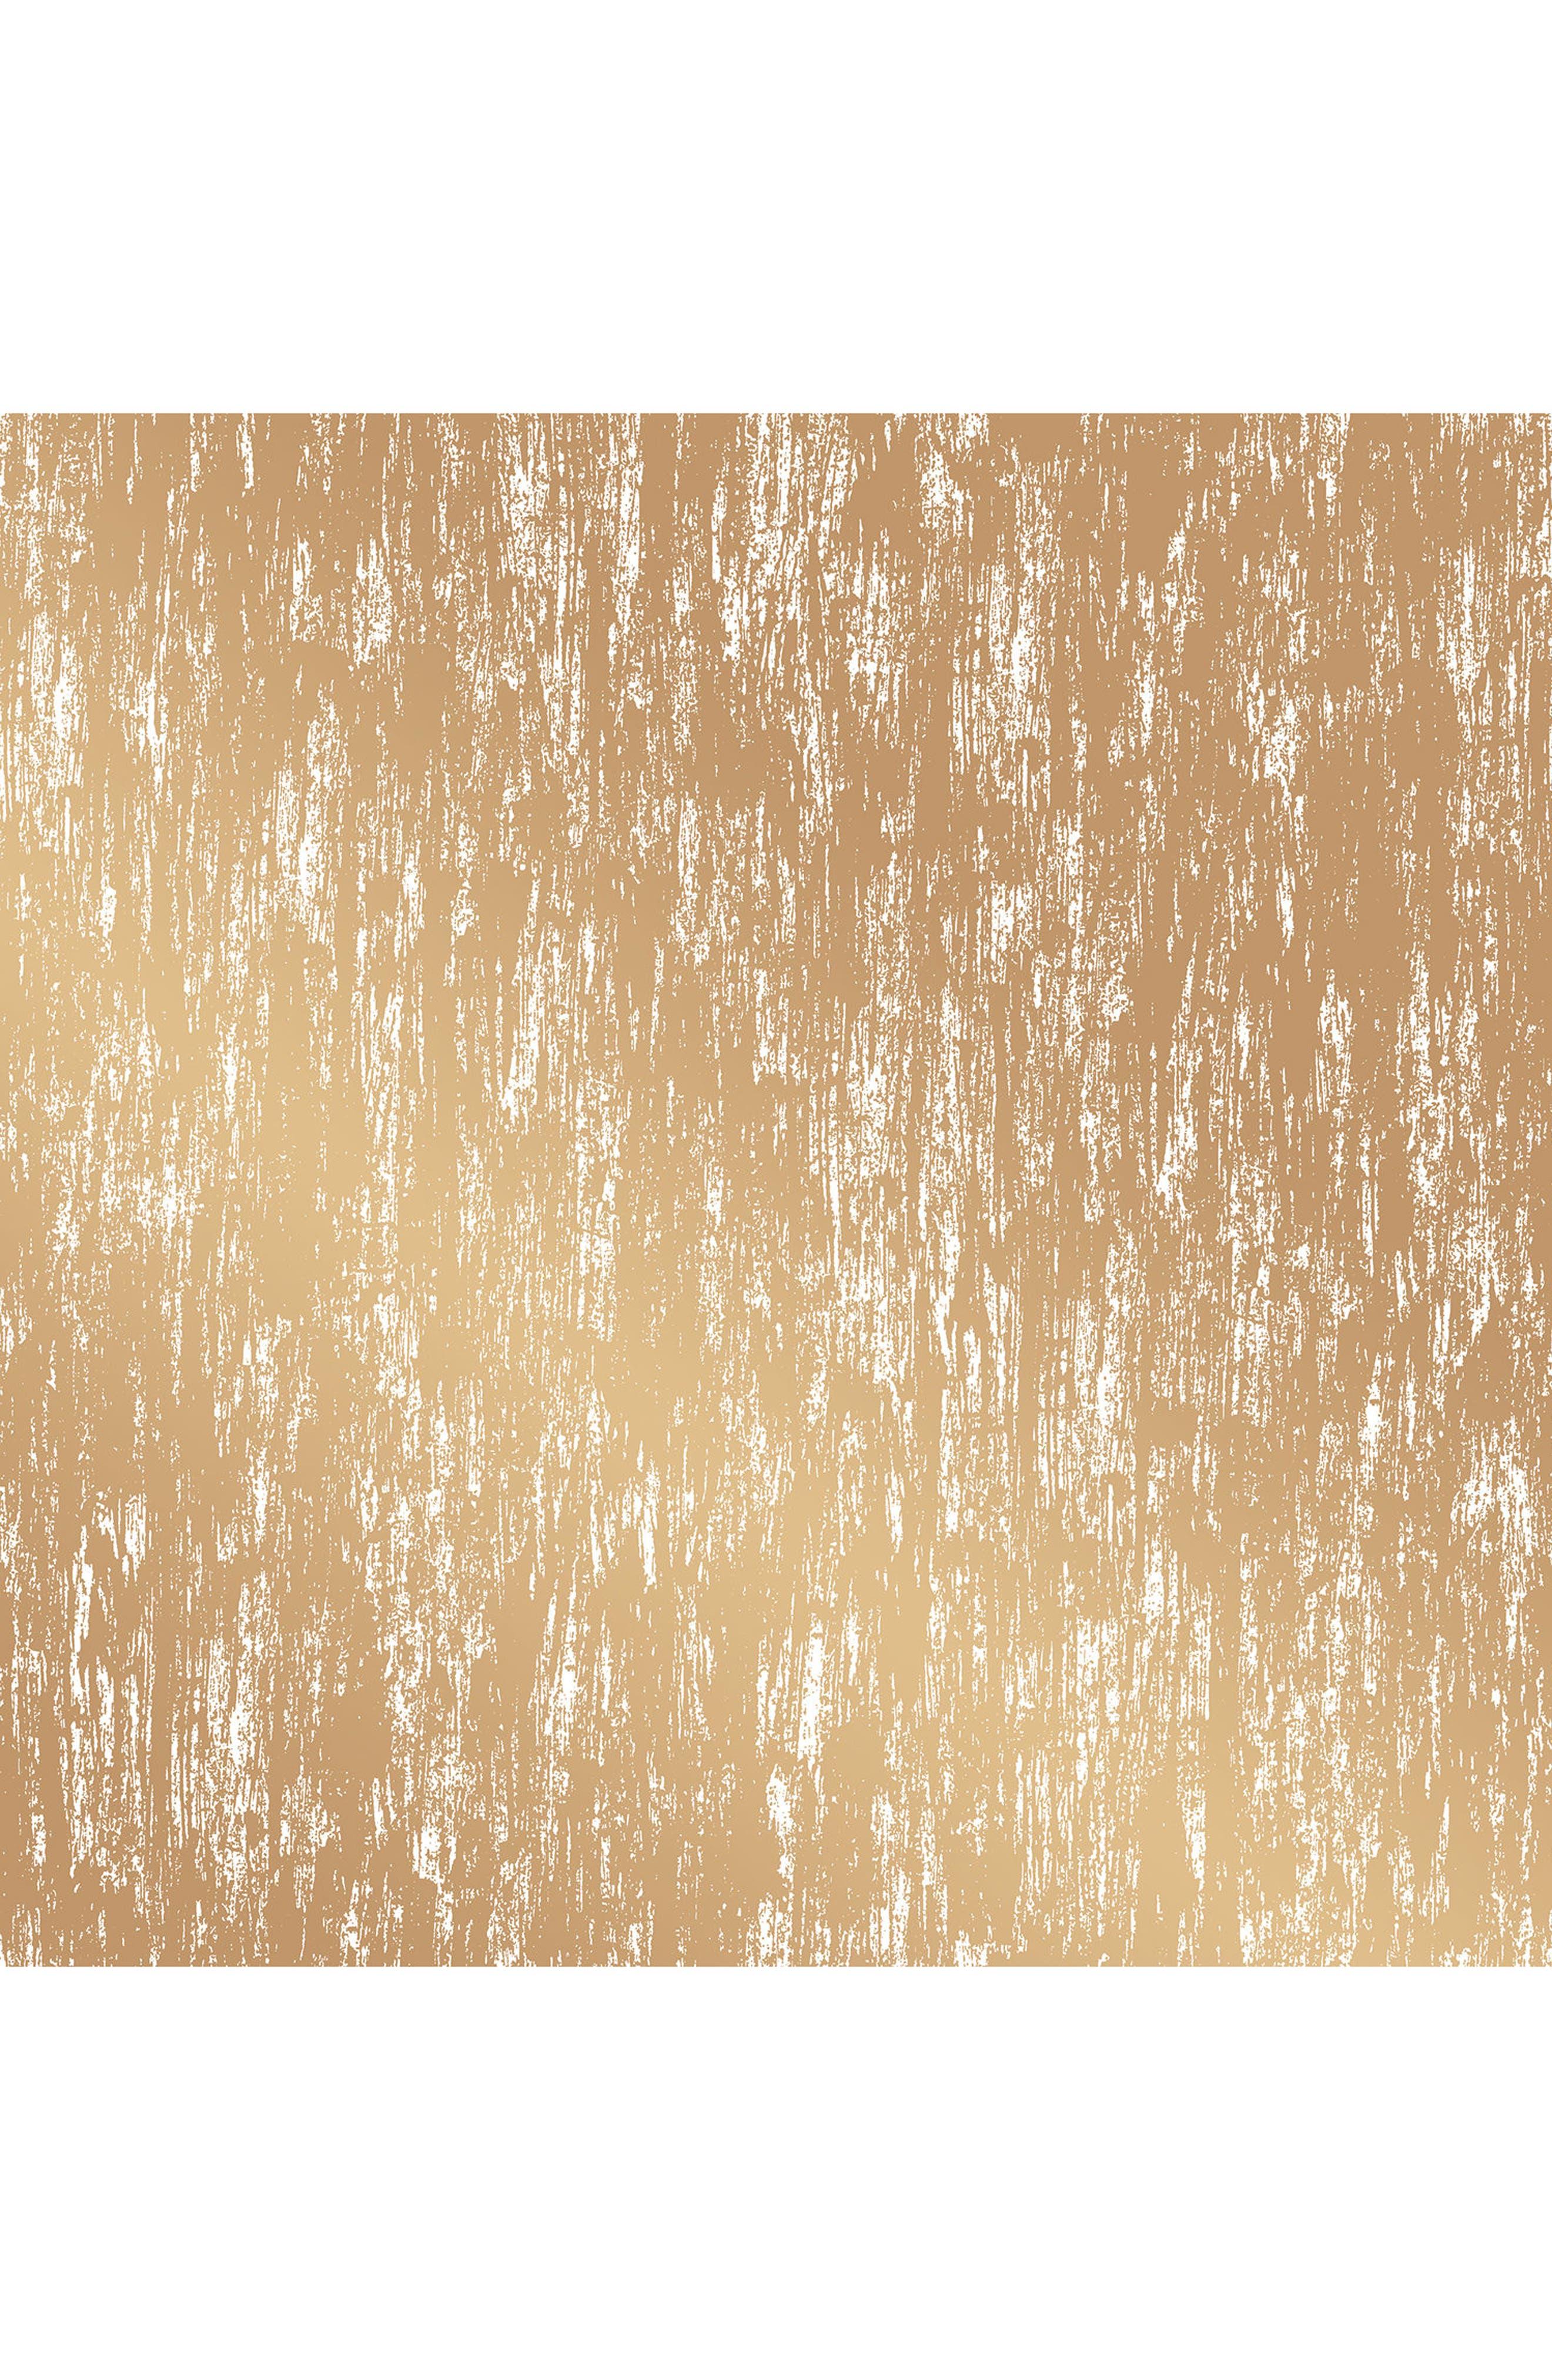 Gold Leaf Self Adhesive Vinyl Wallpaper,                         Main,                         color,